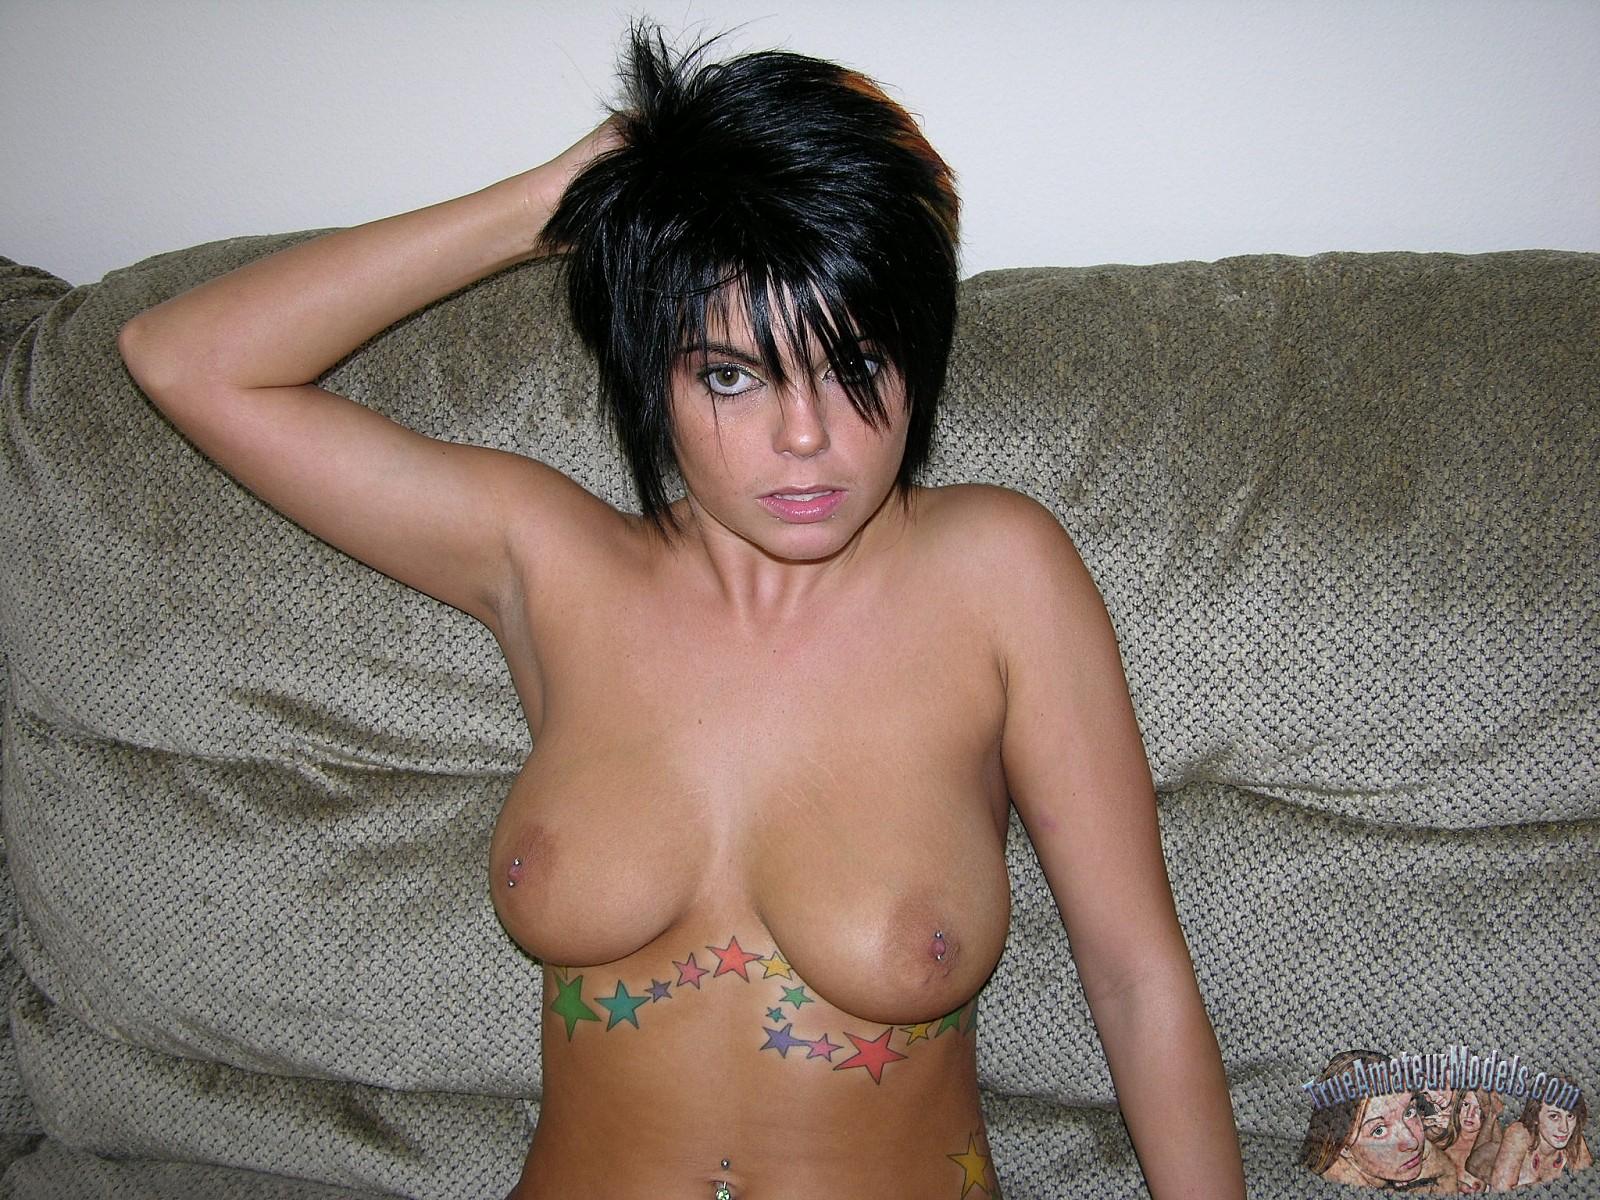 punk rock model nude